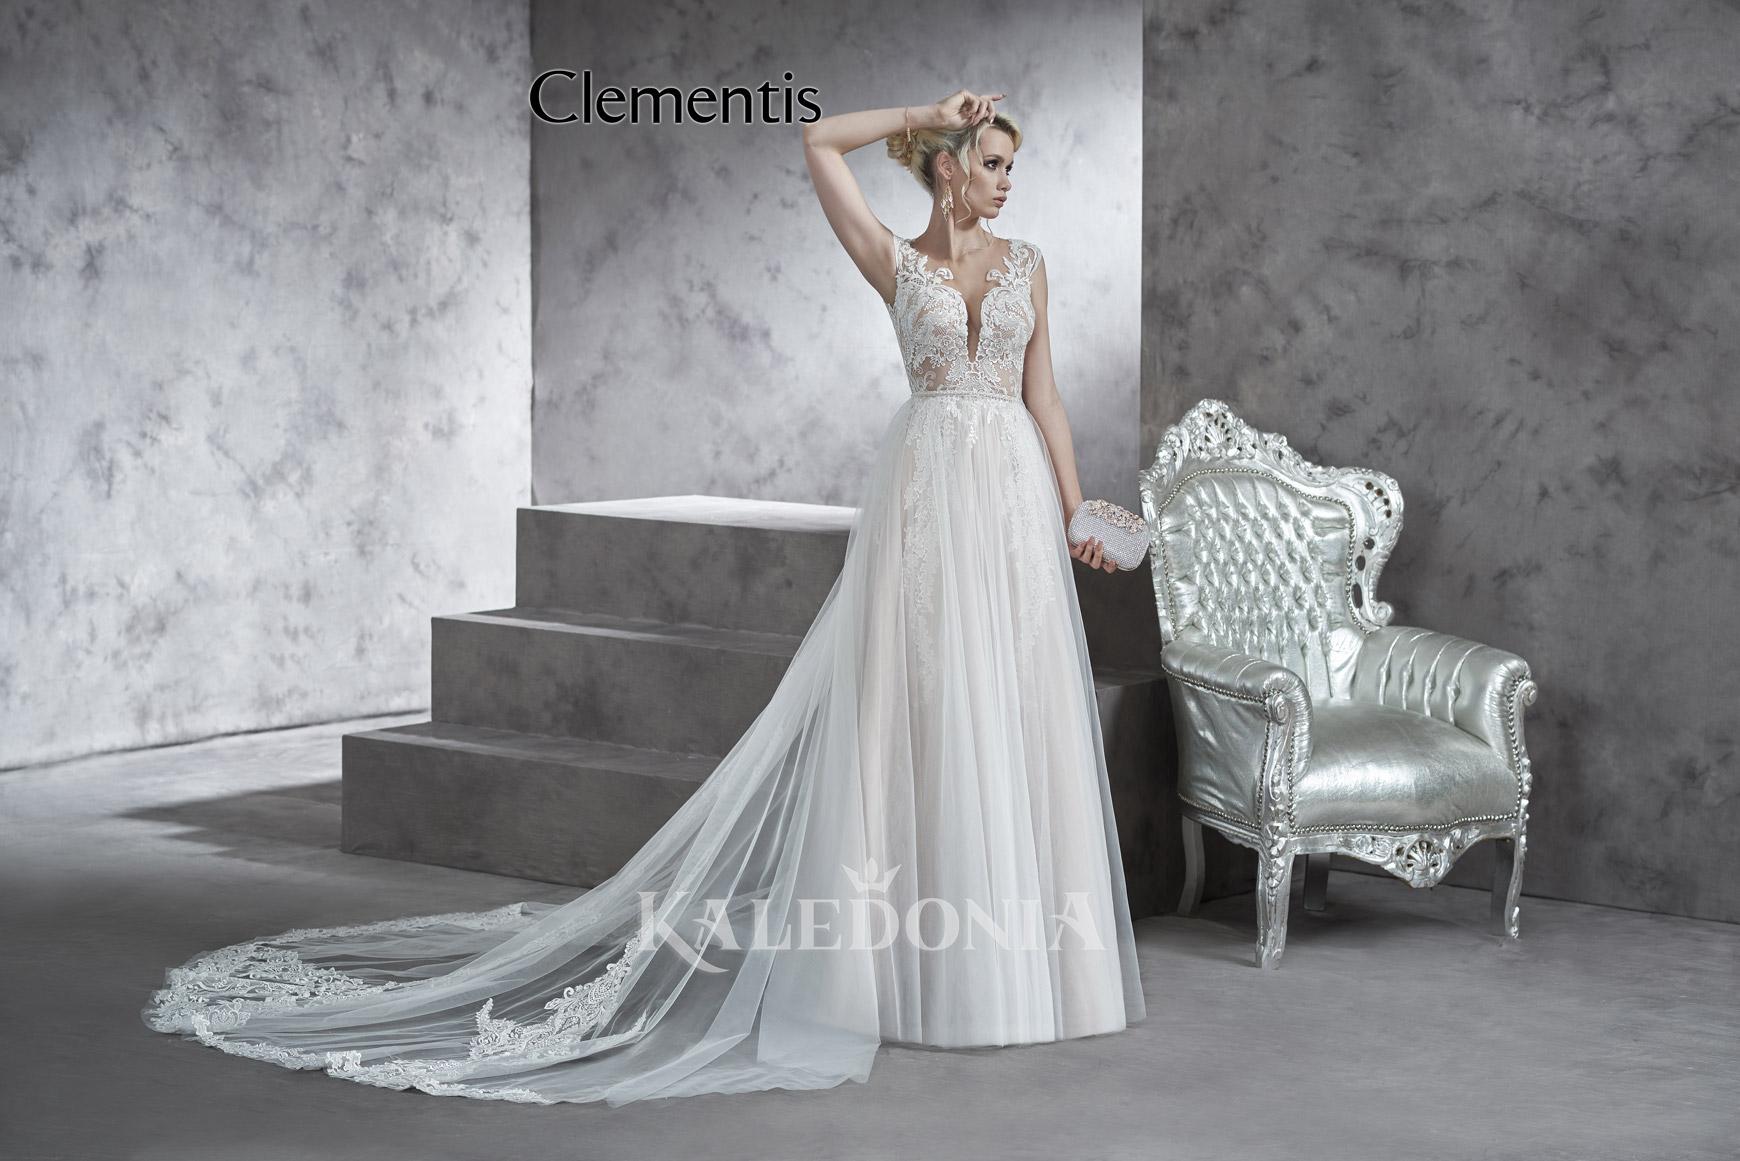 Clementis